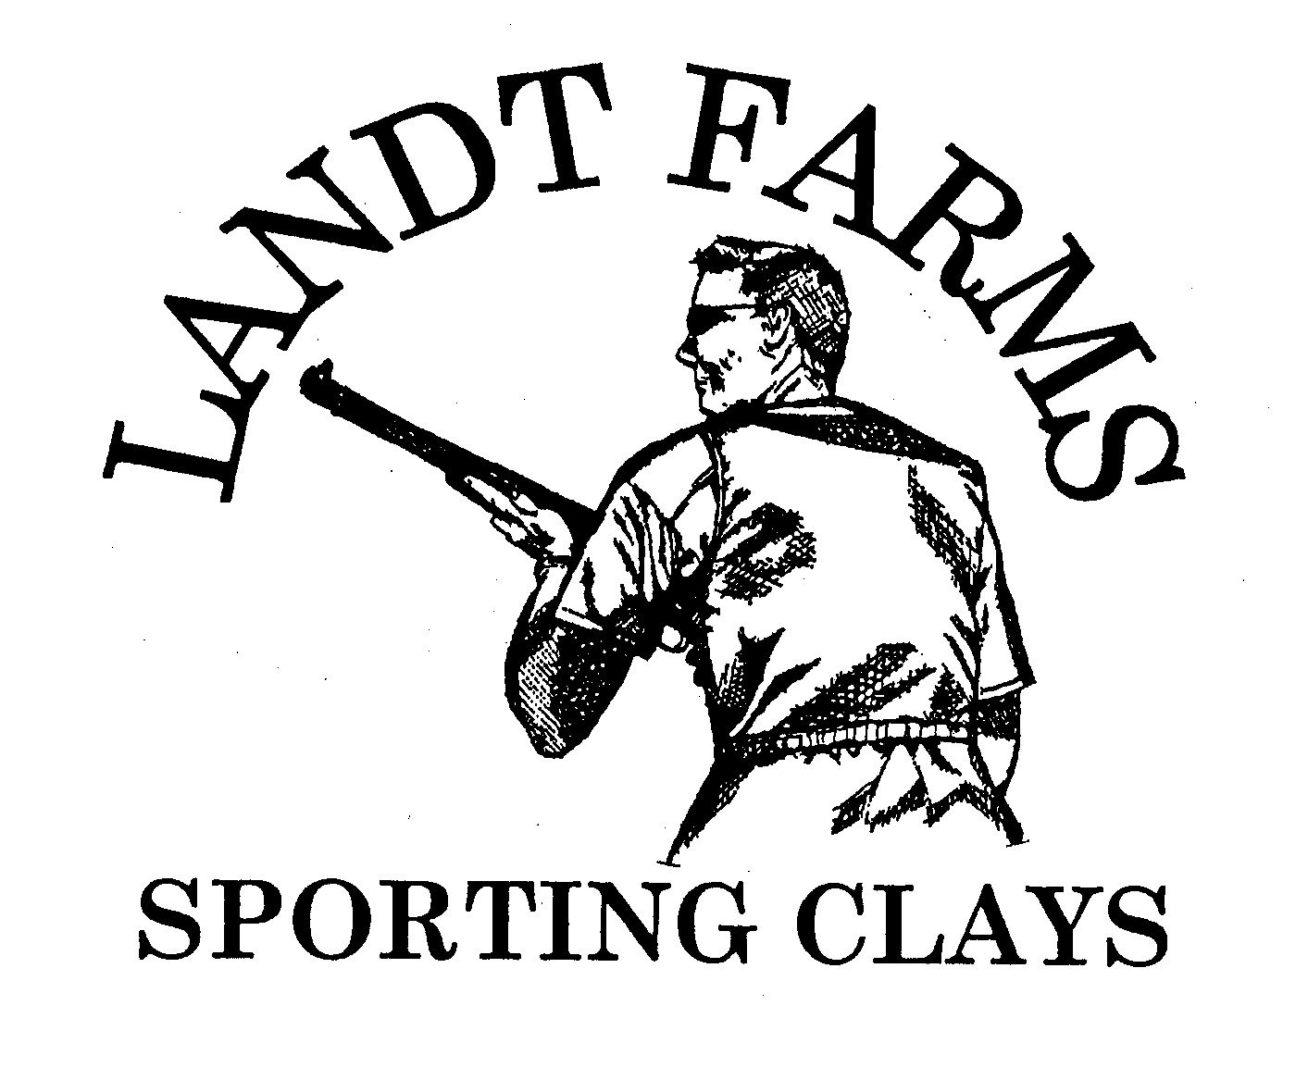 Landt Farms Sporting Clays